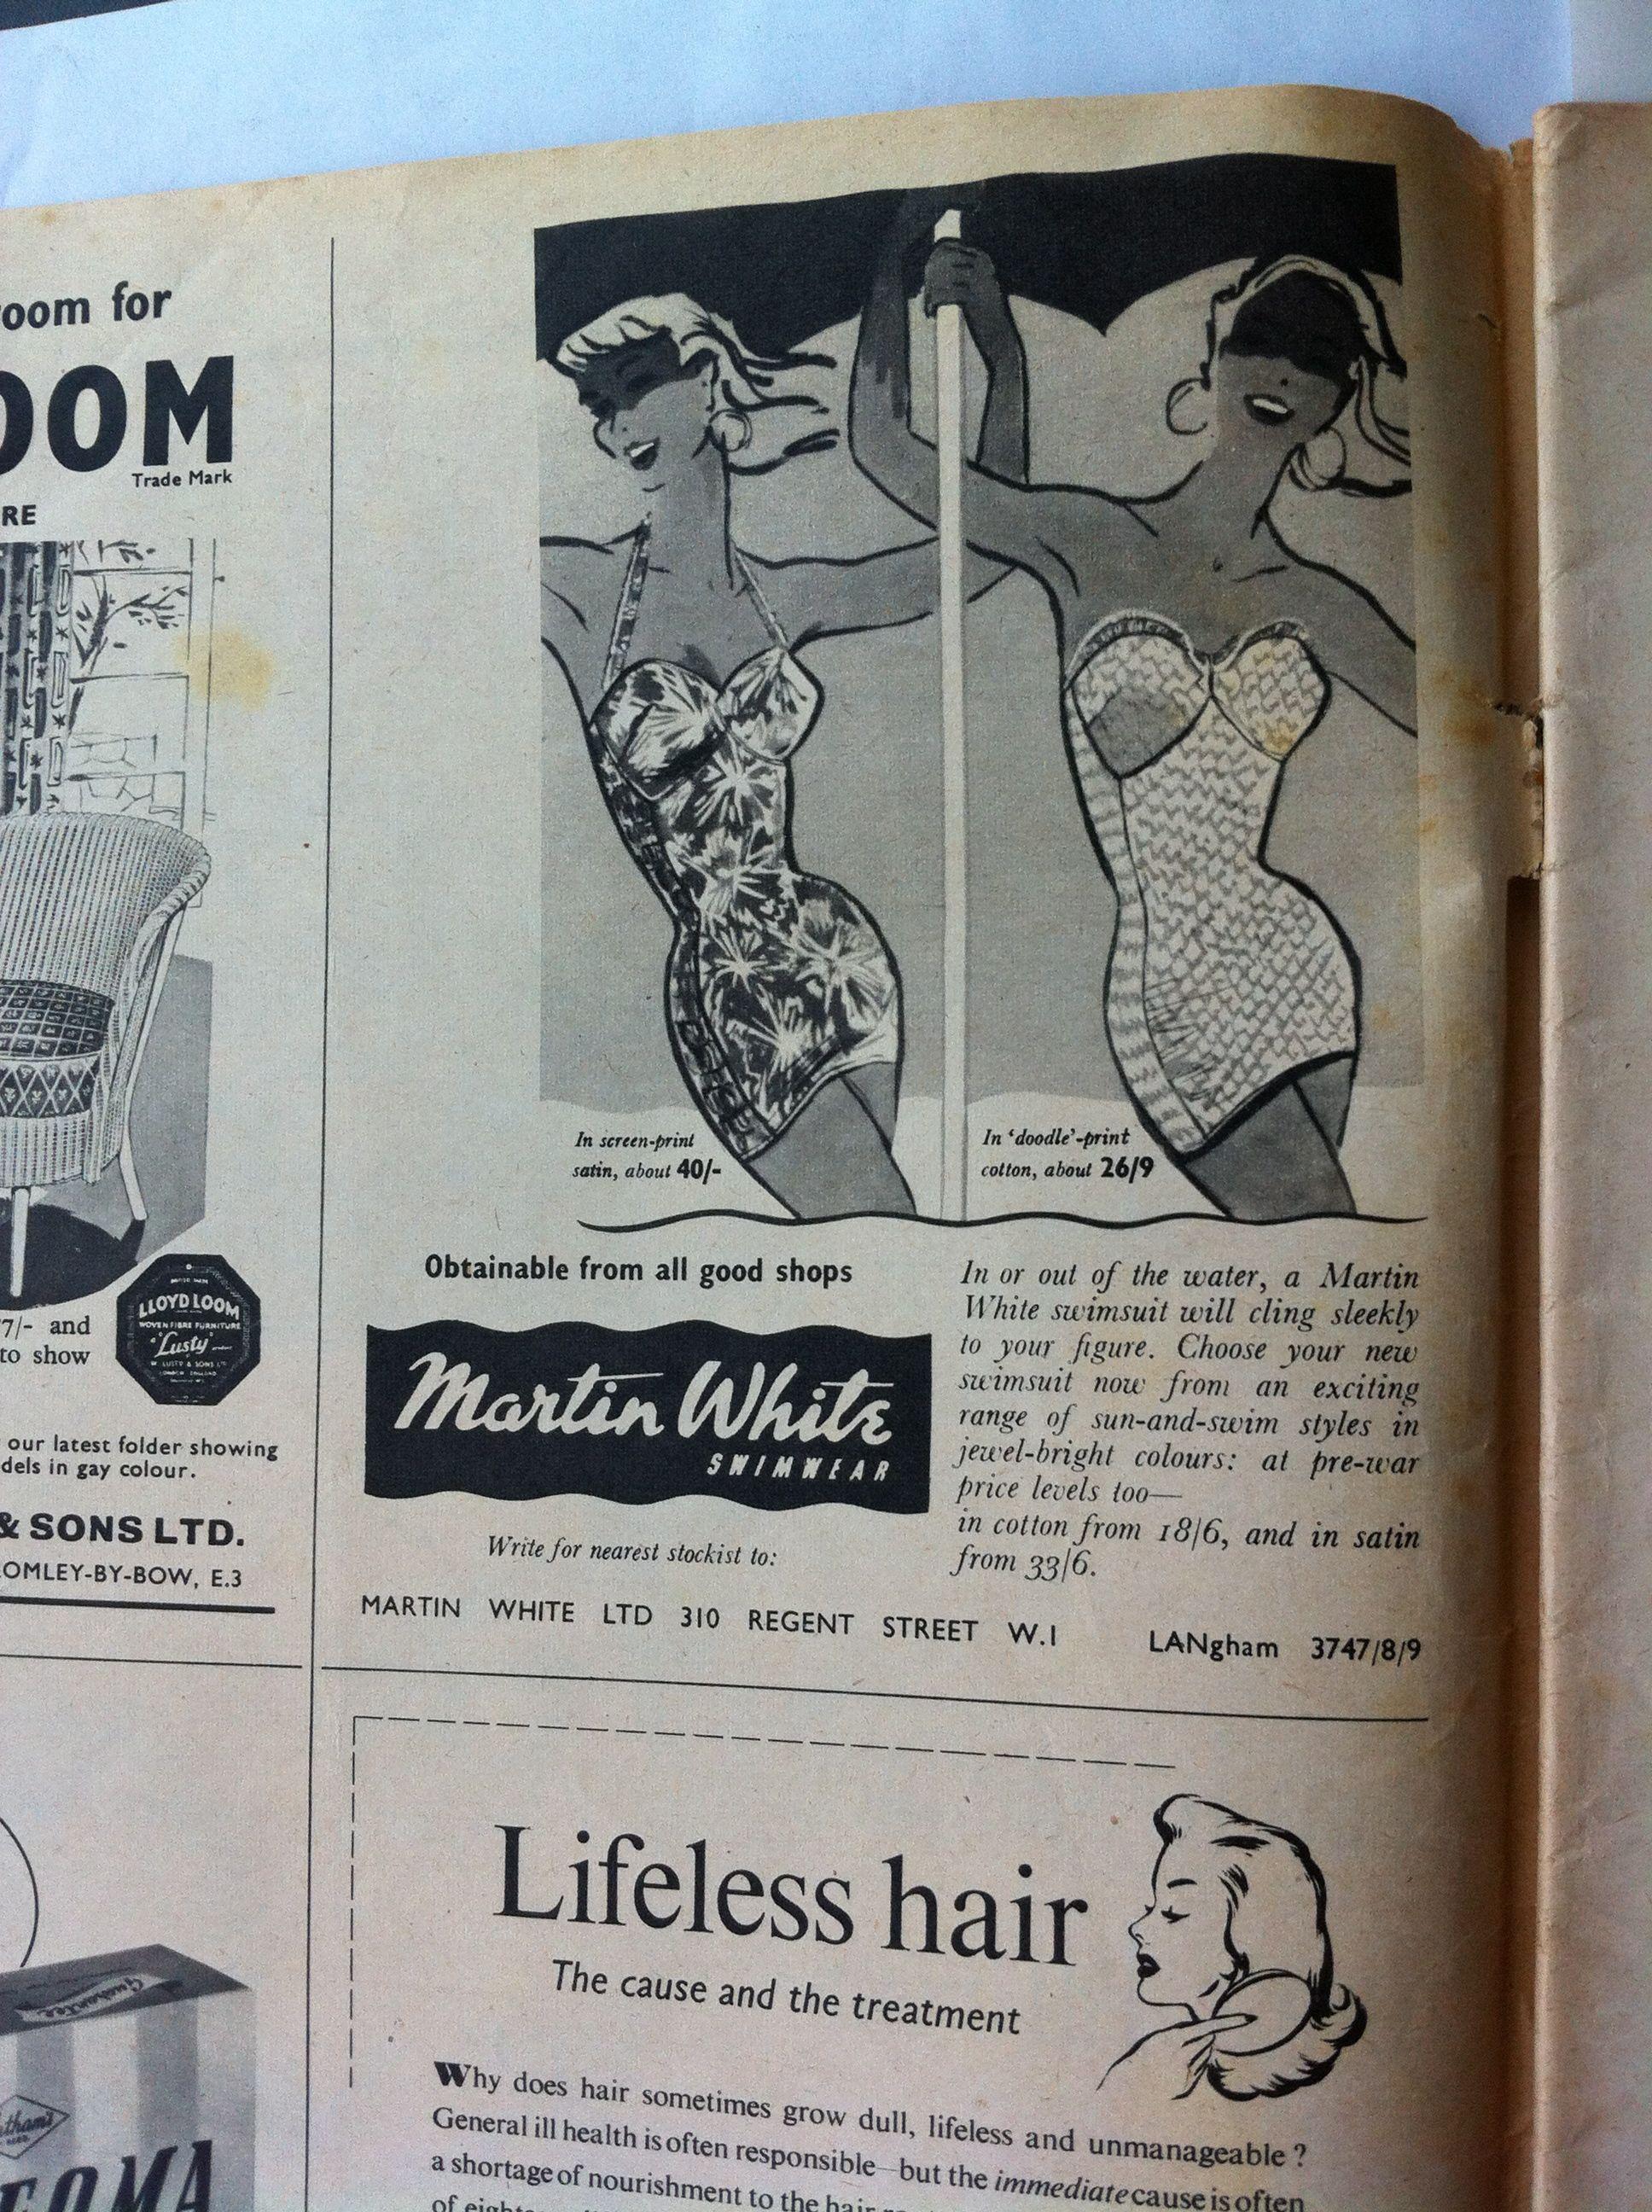 1950s swimwear advert from UK Woman magazine